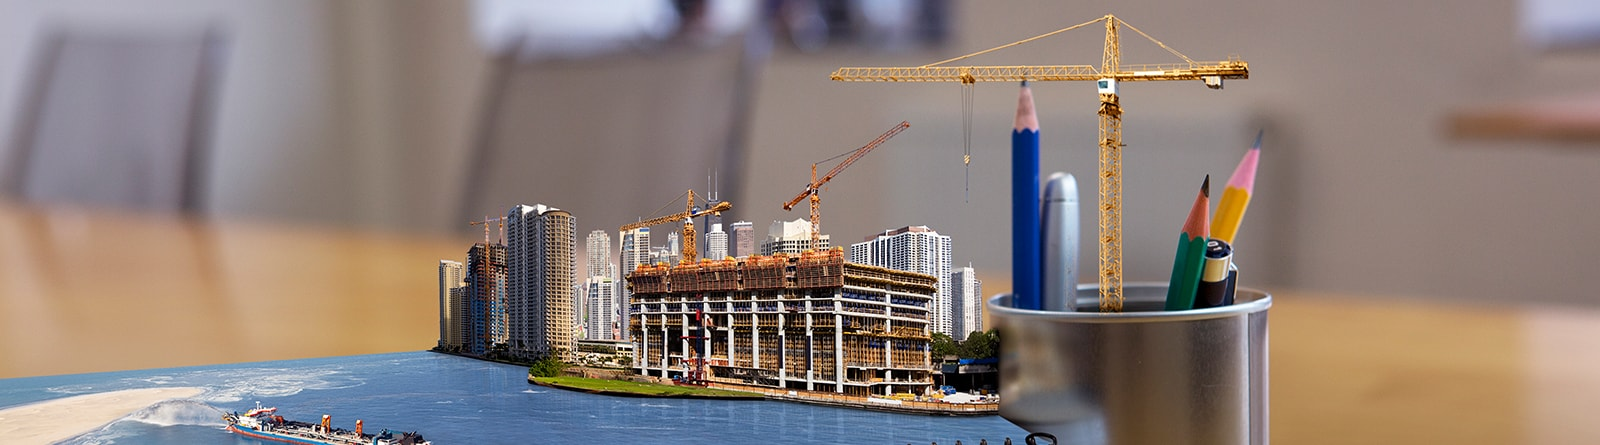 Trelleborg Marine and Infrastructure